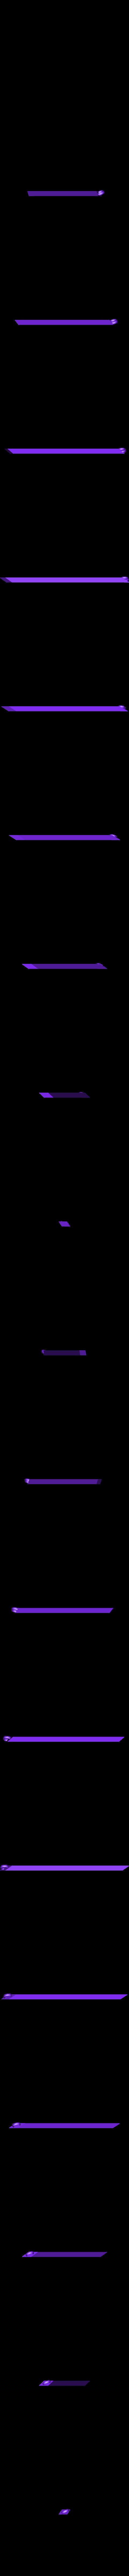 chandelier_slice.STL Télécharger fichier STL gratuit lustre • Objet à imprimer en 3D, Fayeya